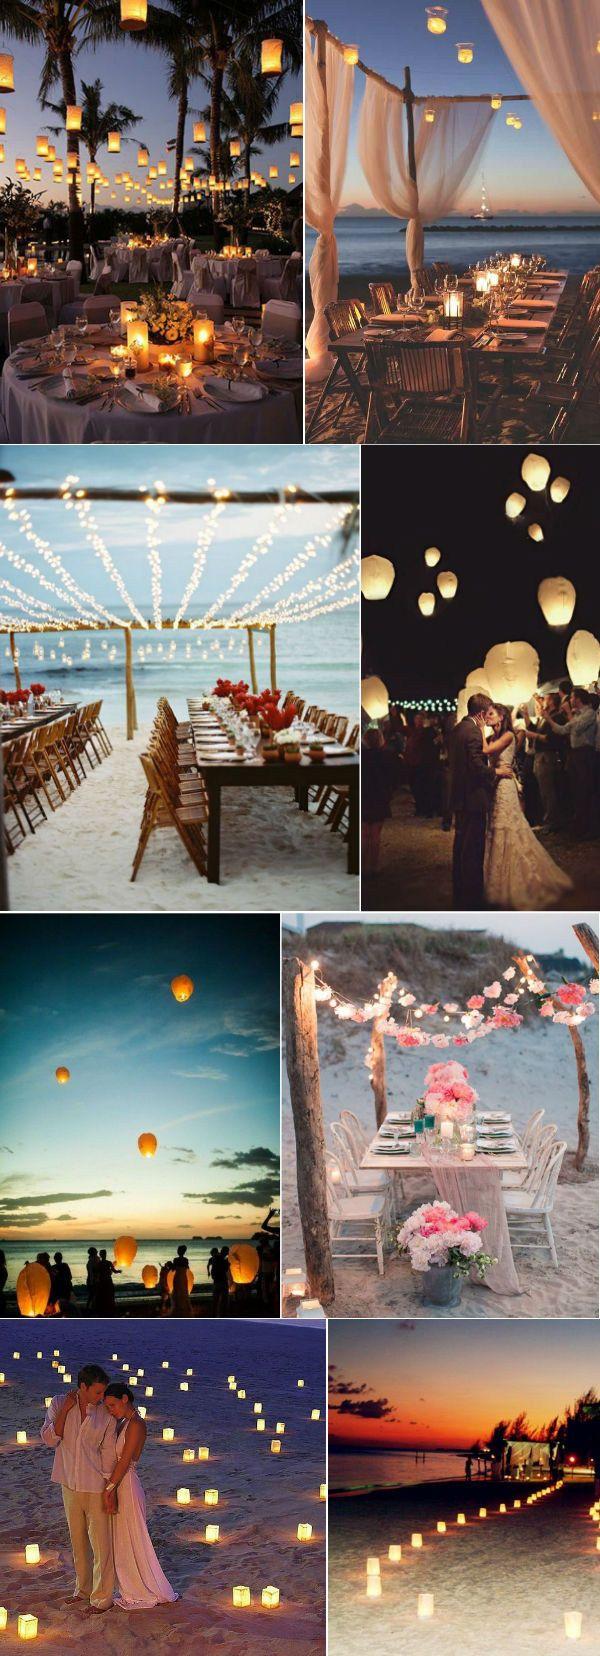 Wedding decoration ideas beach theme   Beach Themed Wedding Ideas For  Brides  Wedding Ideas and